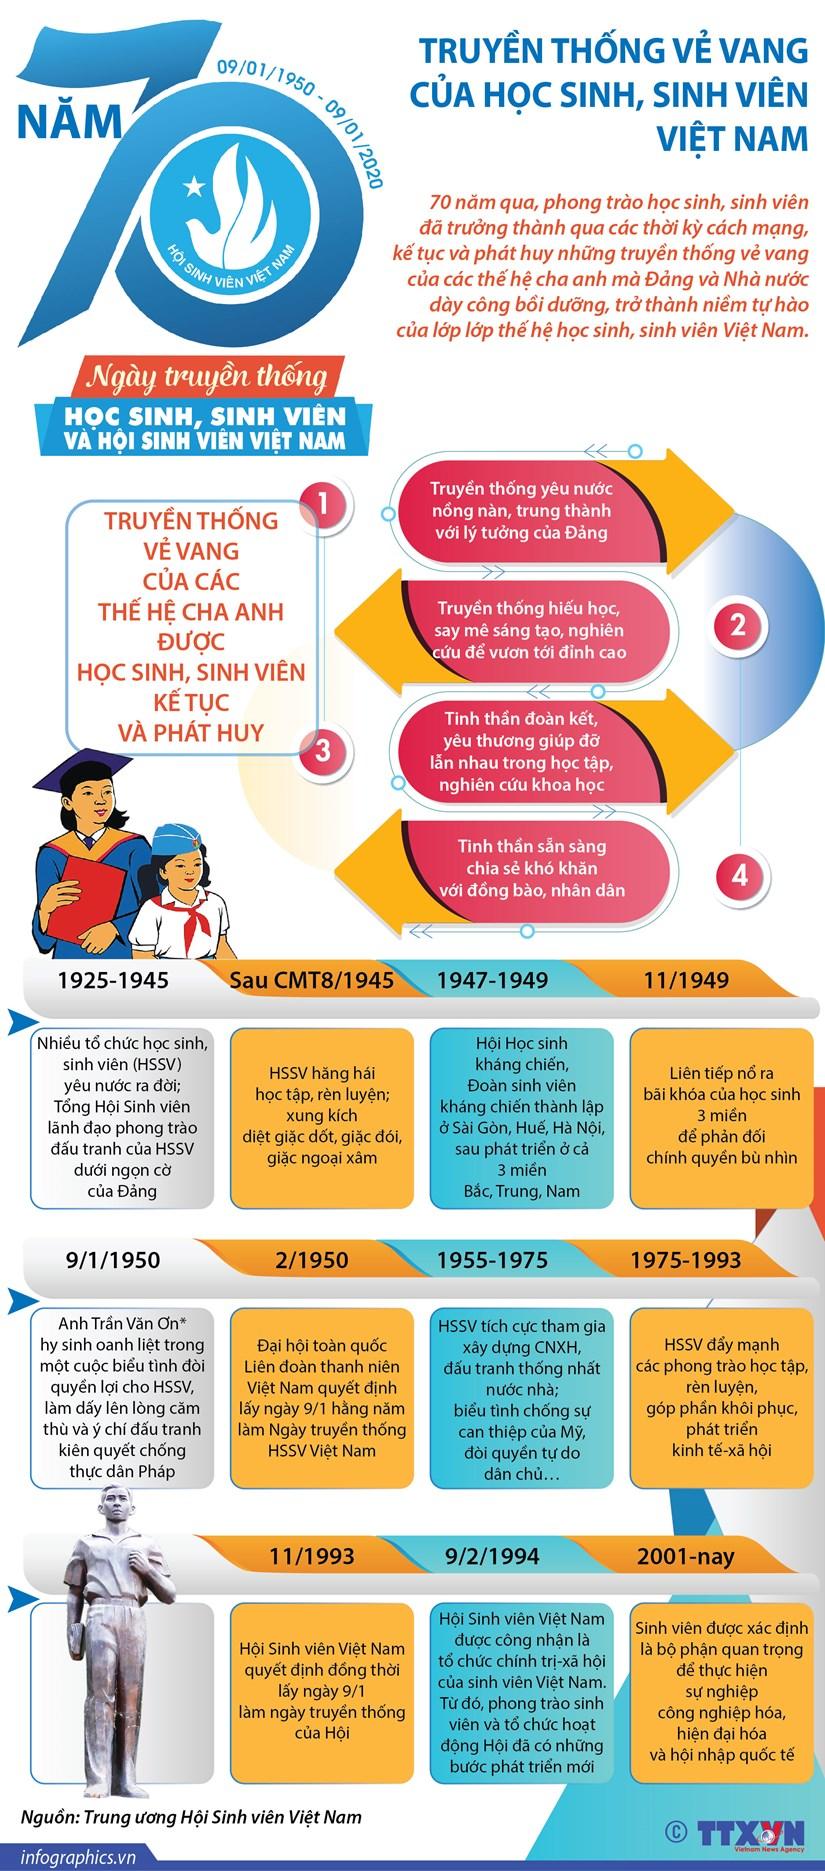 [Infographics] 70 nam truyen thong cua hoc sinh, sinh vien Viet Nam hinh anh 1